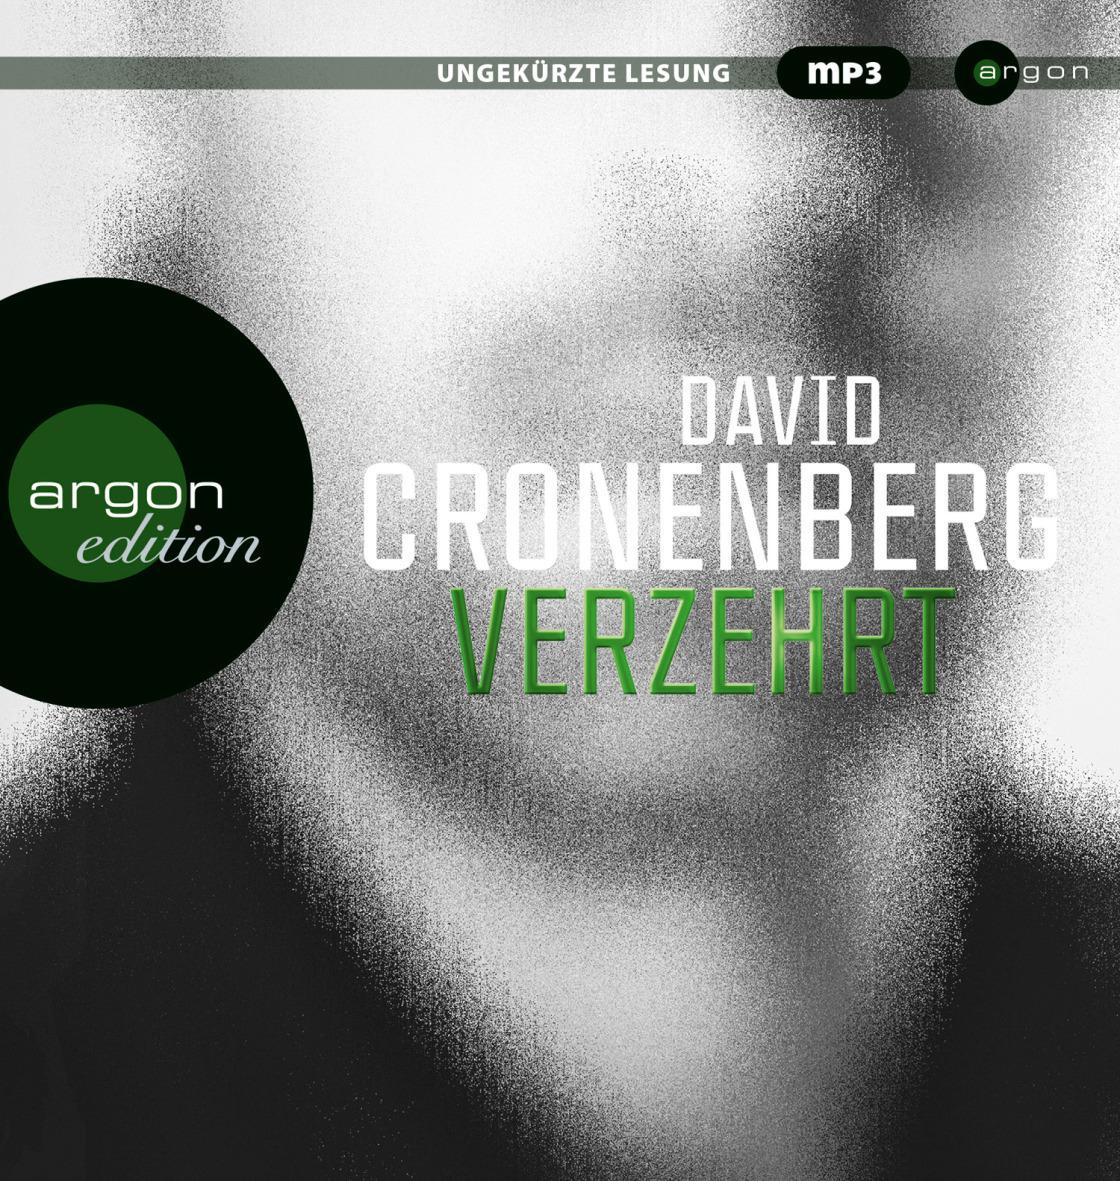 Verzehrt - David Cronenberg [Audio CD]